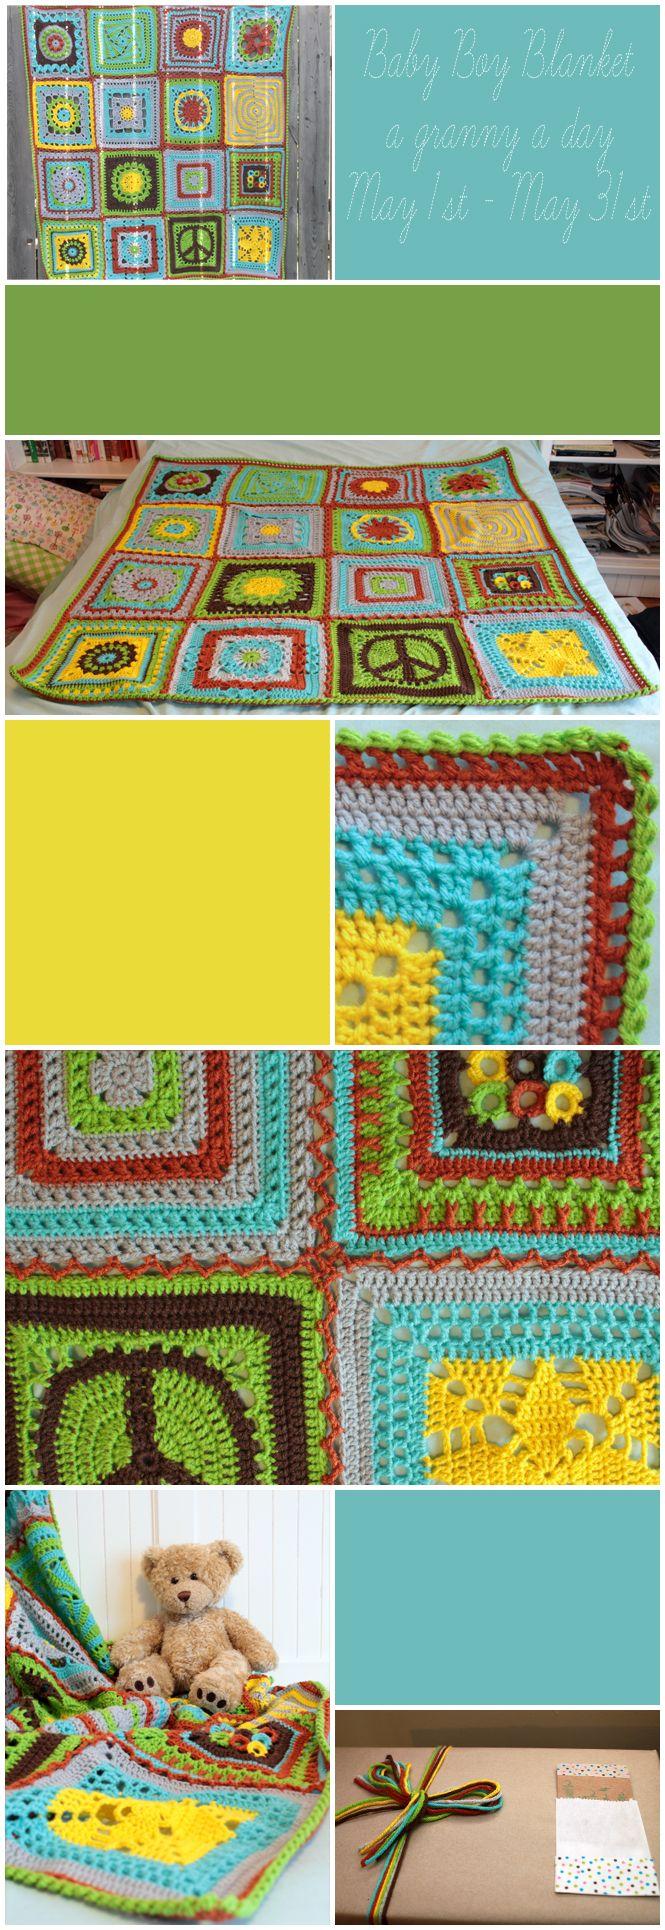 Crochet stitch _Post